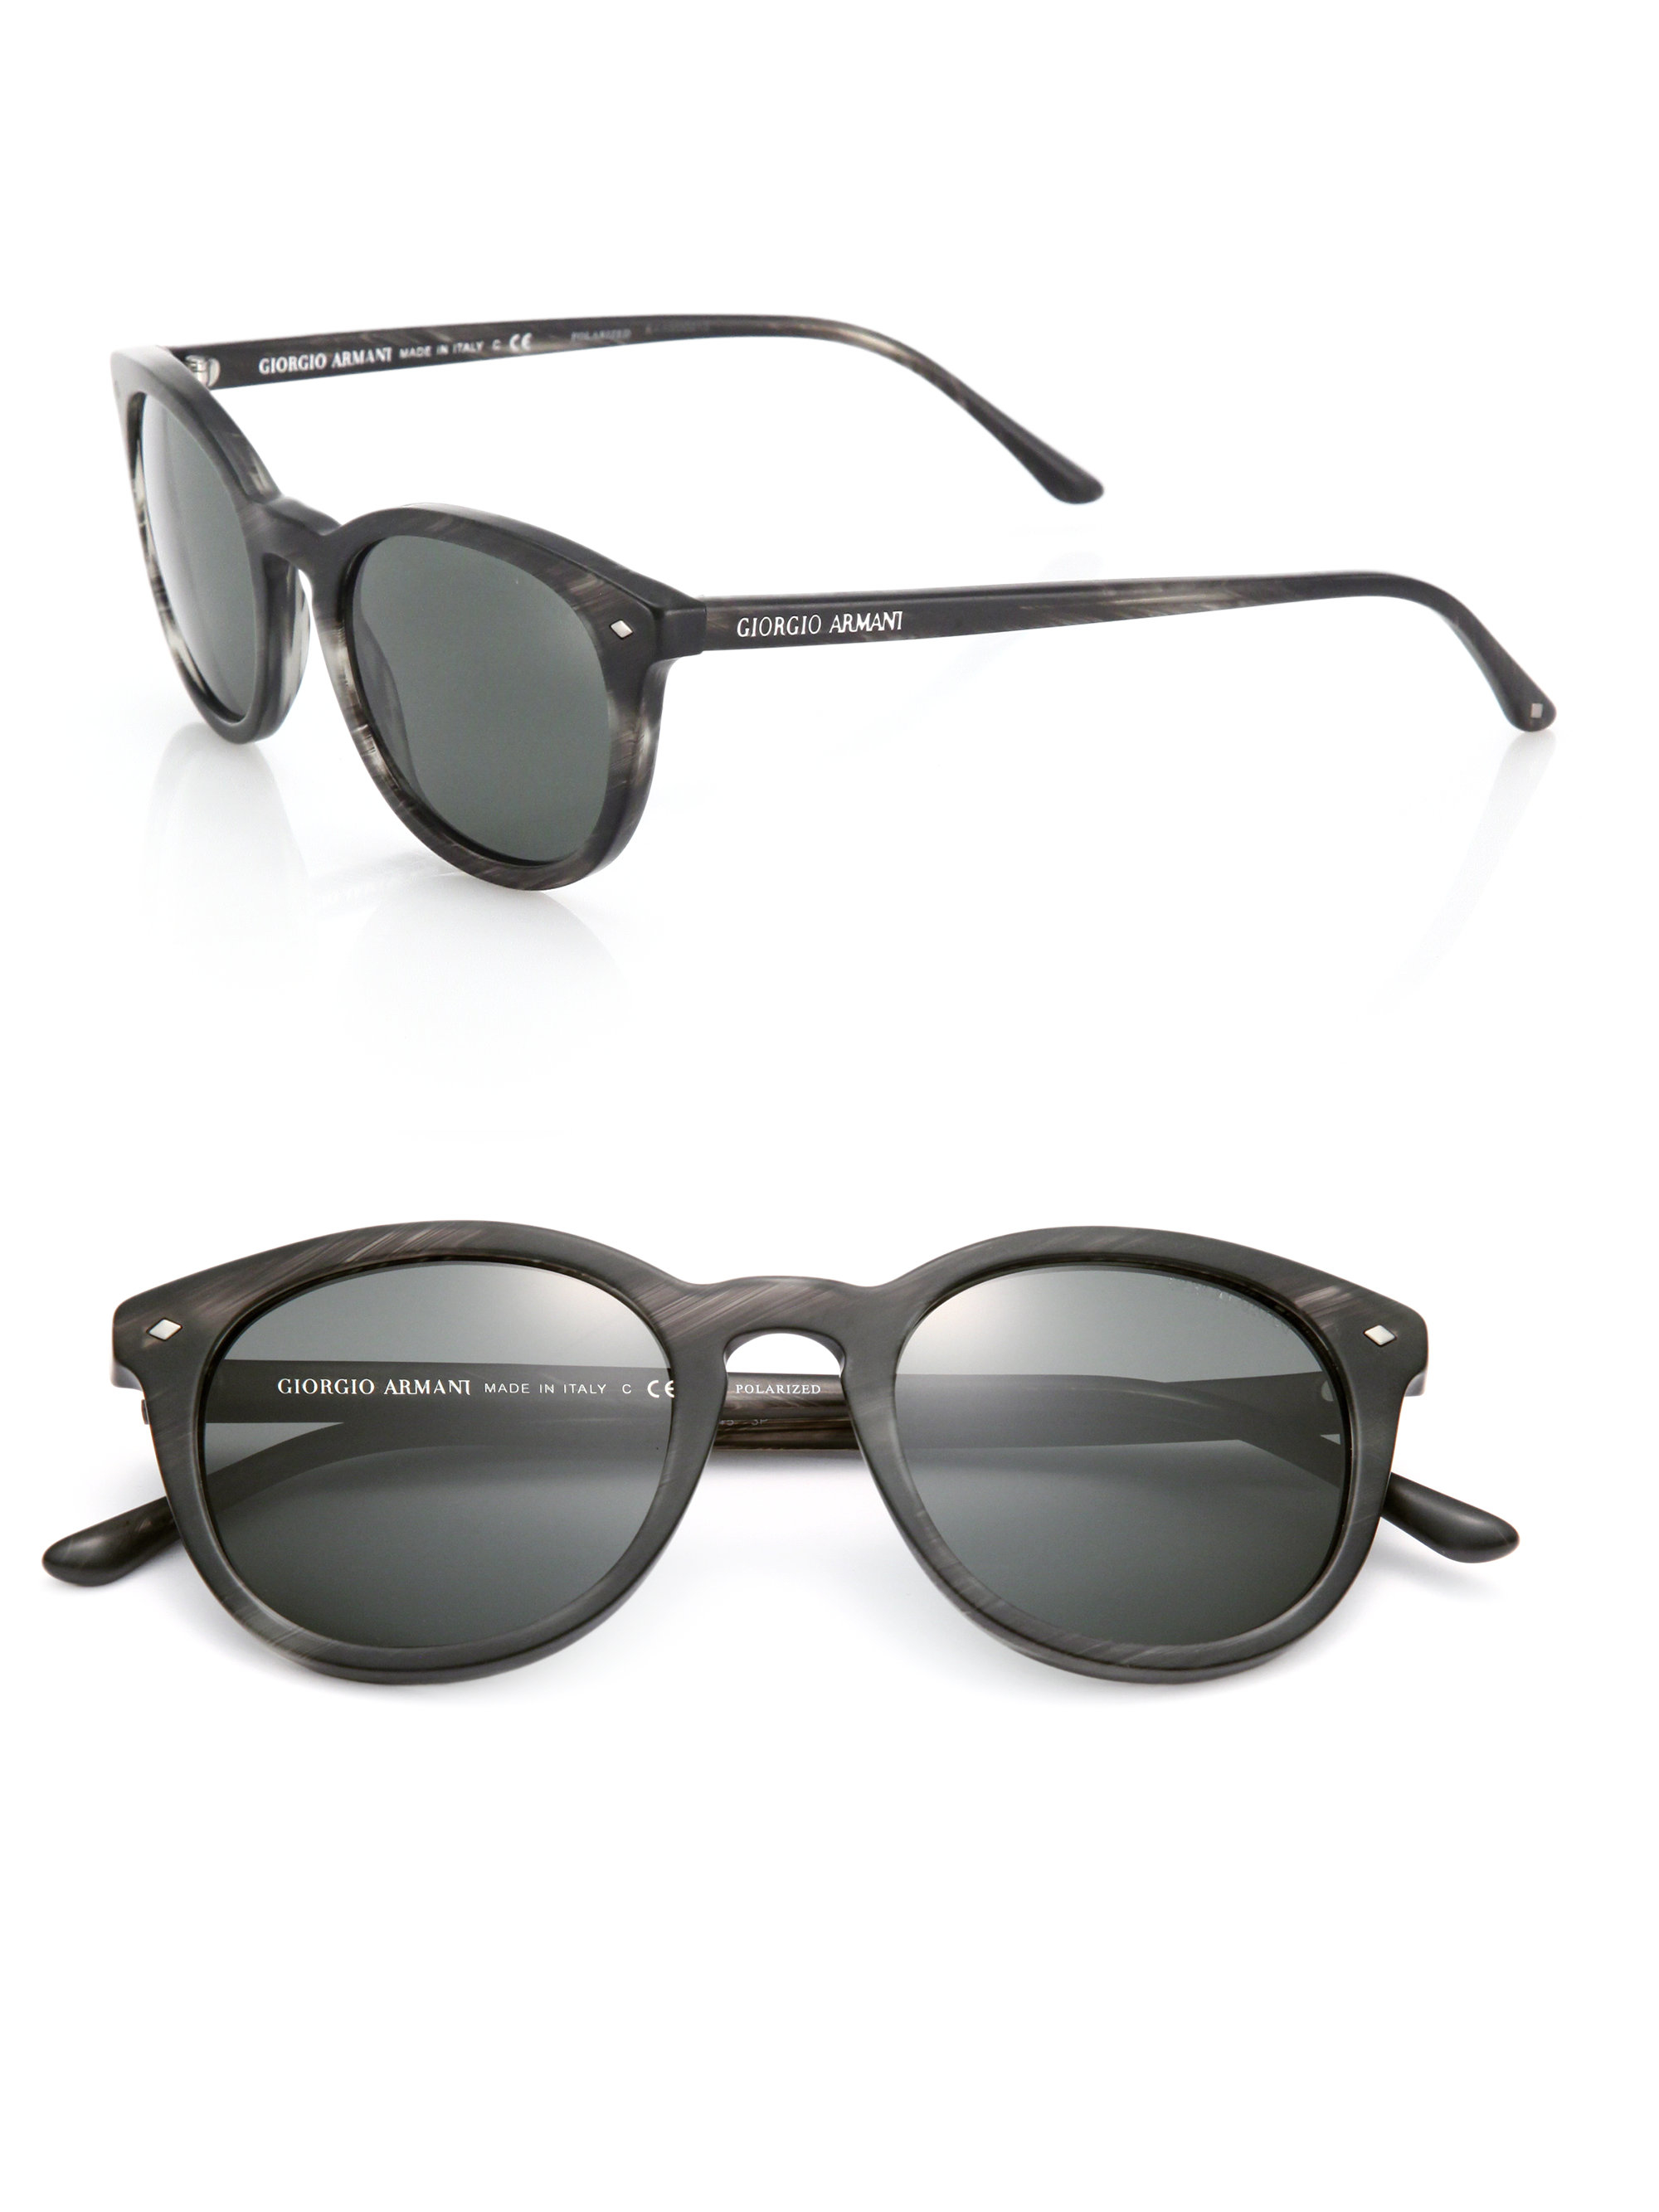 8a843343d40 Armani Sunglasses 8034 Gray